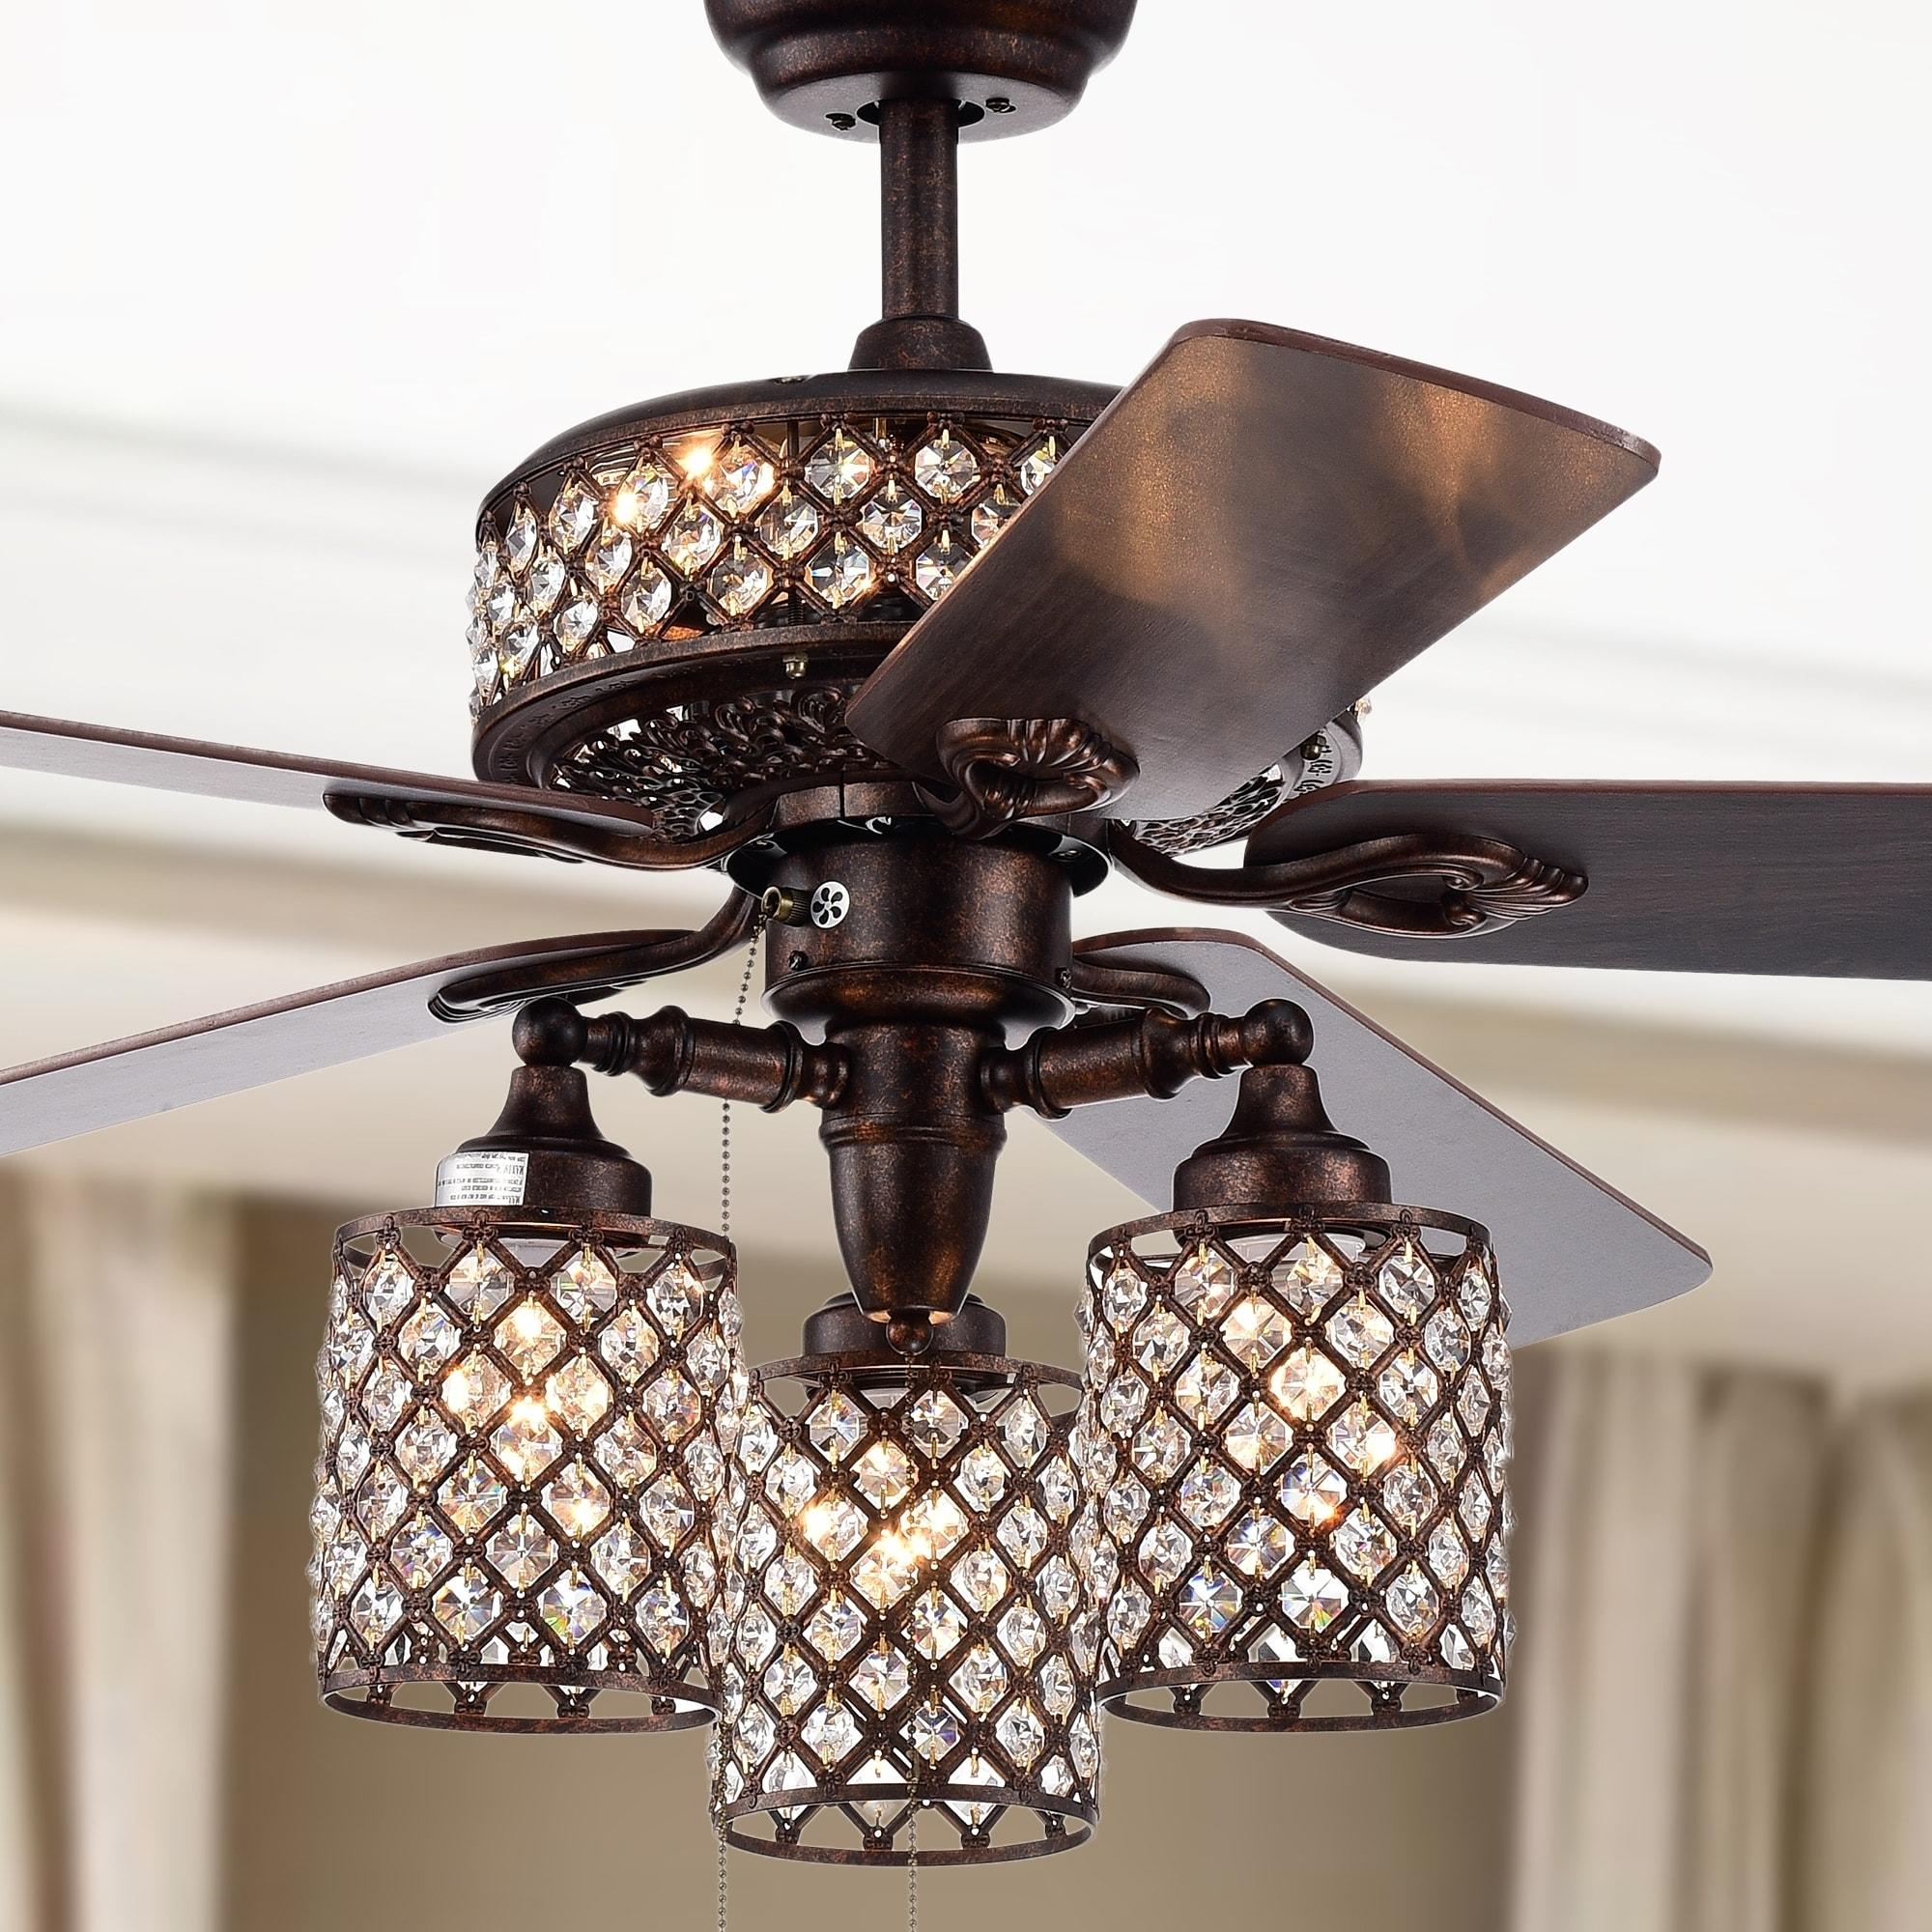 Image of: Shop Black Friday Deals On Pristil 5 Blade 52 Inch Rustic Bronze Lighted Ceiling Fans With Crystal Grid Shade 2 Color Option Blades Overstock 22580751